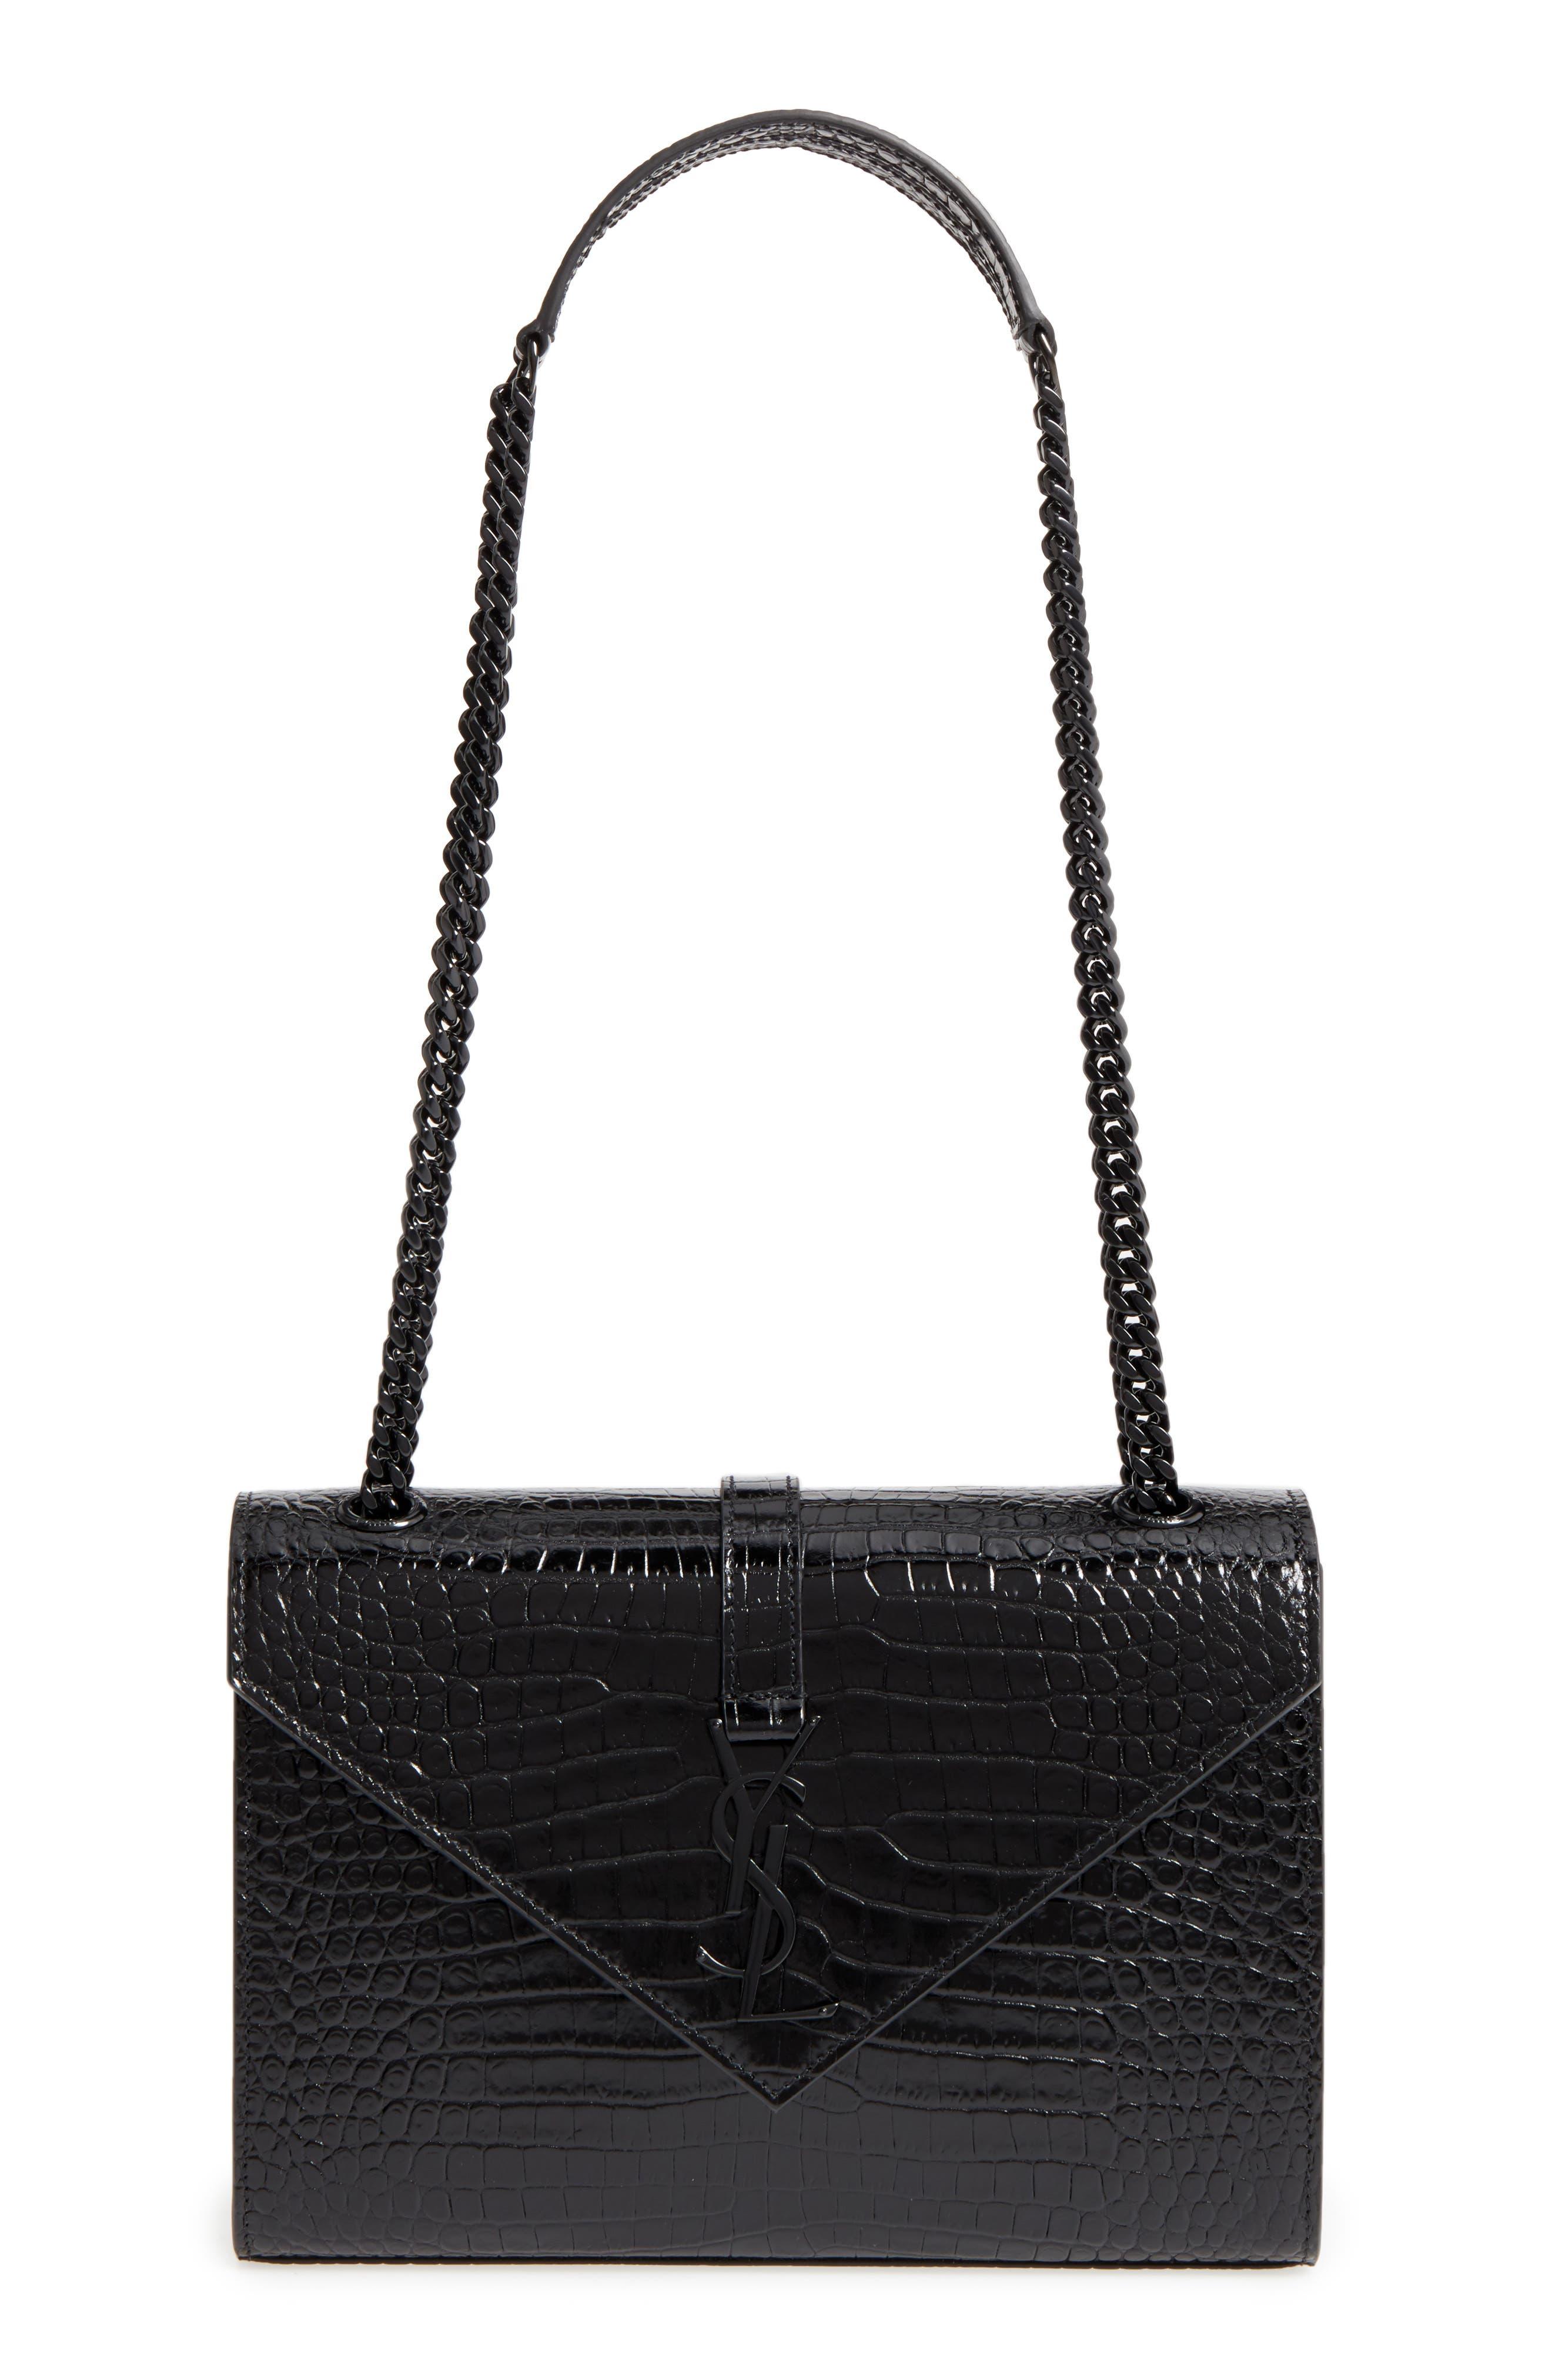 Saint Laurent Medium Croc-Embossed Calfskin Shoulder Bag